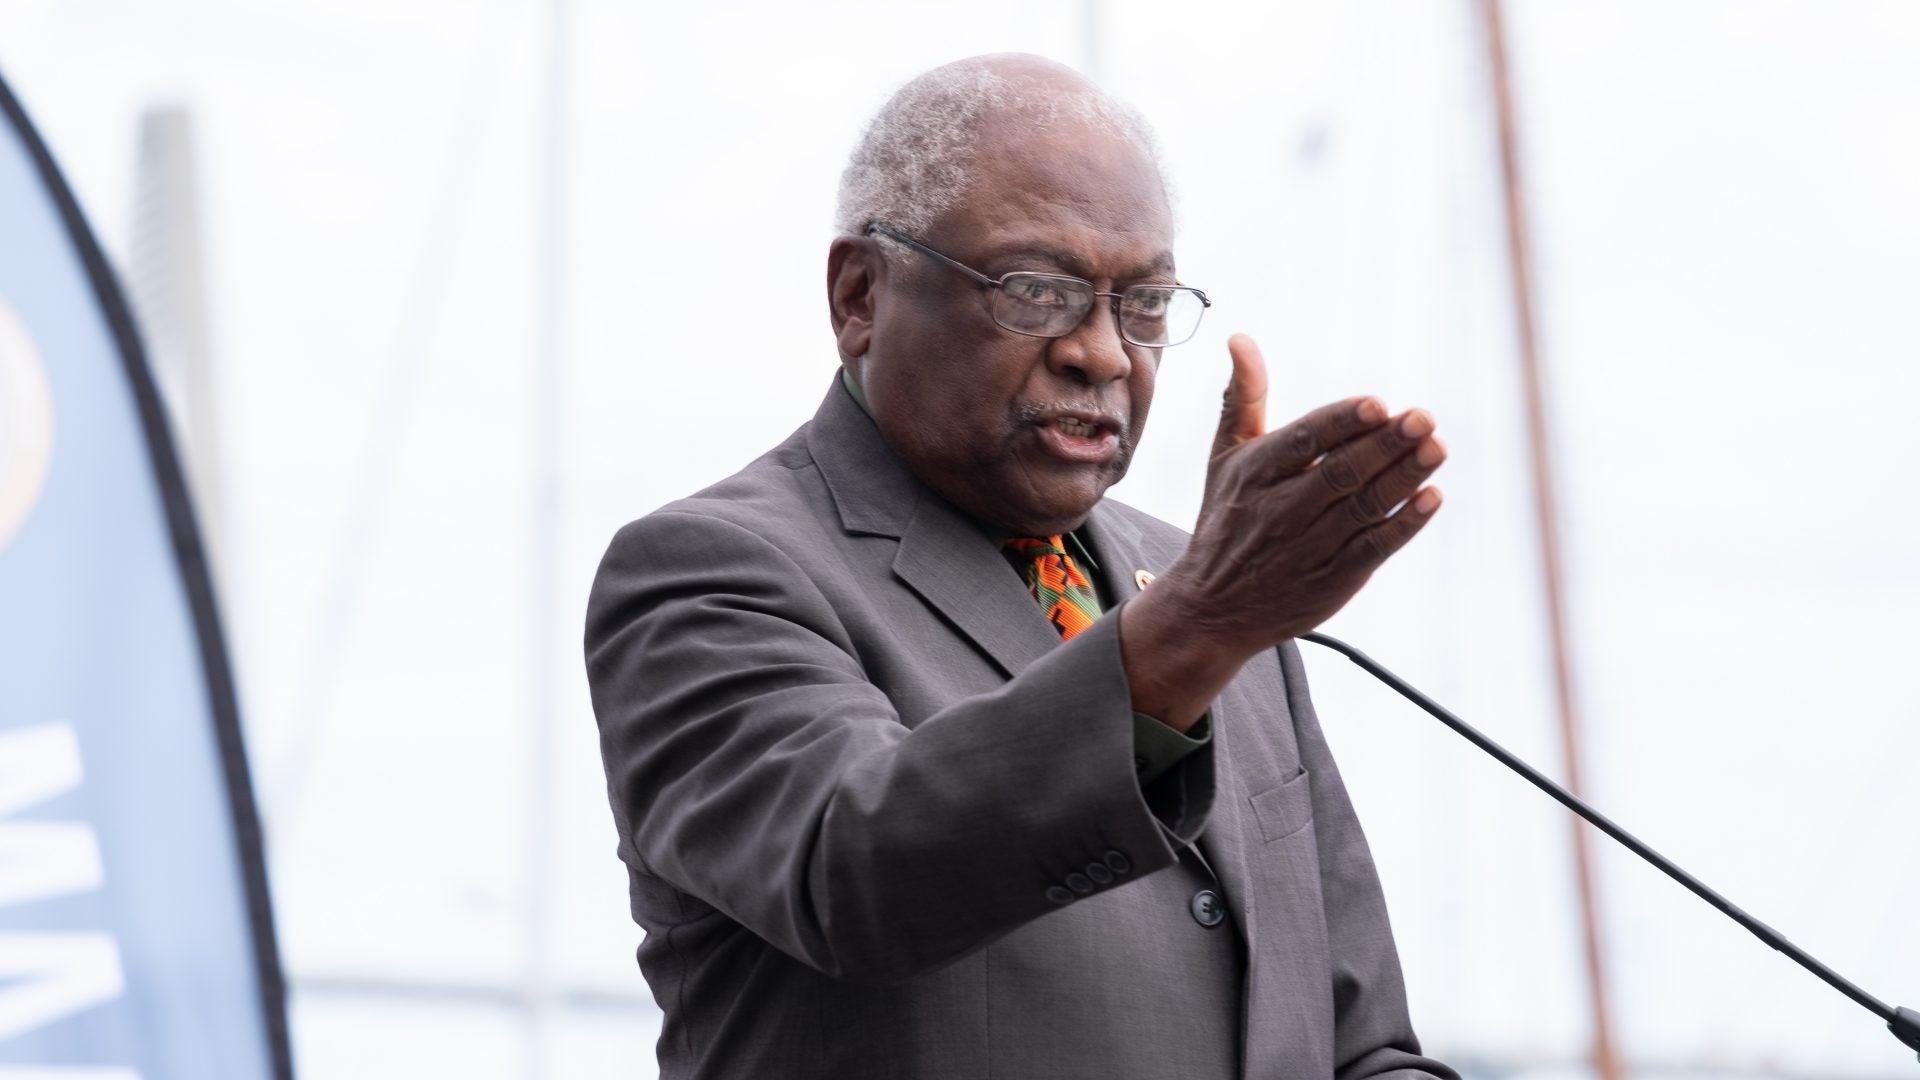 A Tearful Jim Clyburn Helps Break Ground On International African American Museum